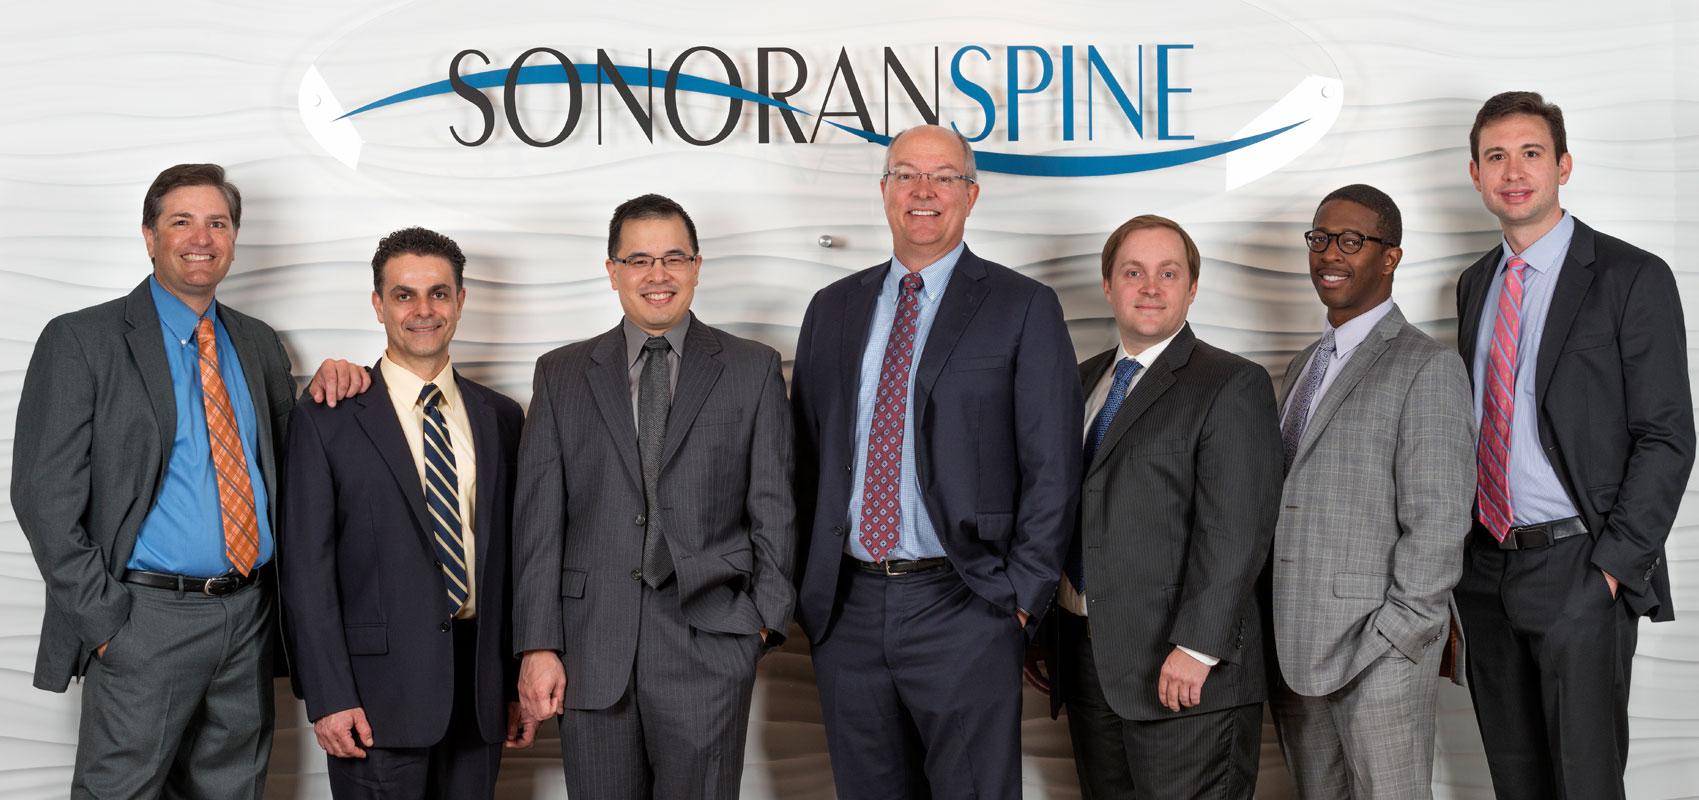 Sonoran Spine Arizona Spine Surgeons Pain Management Specialists